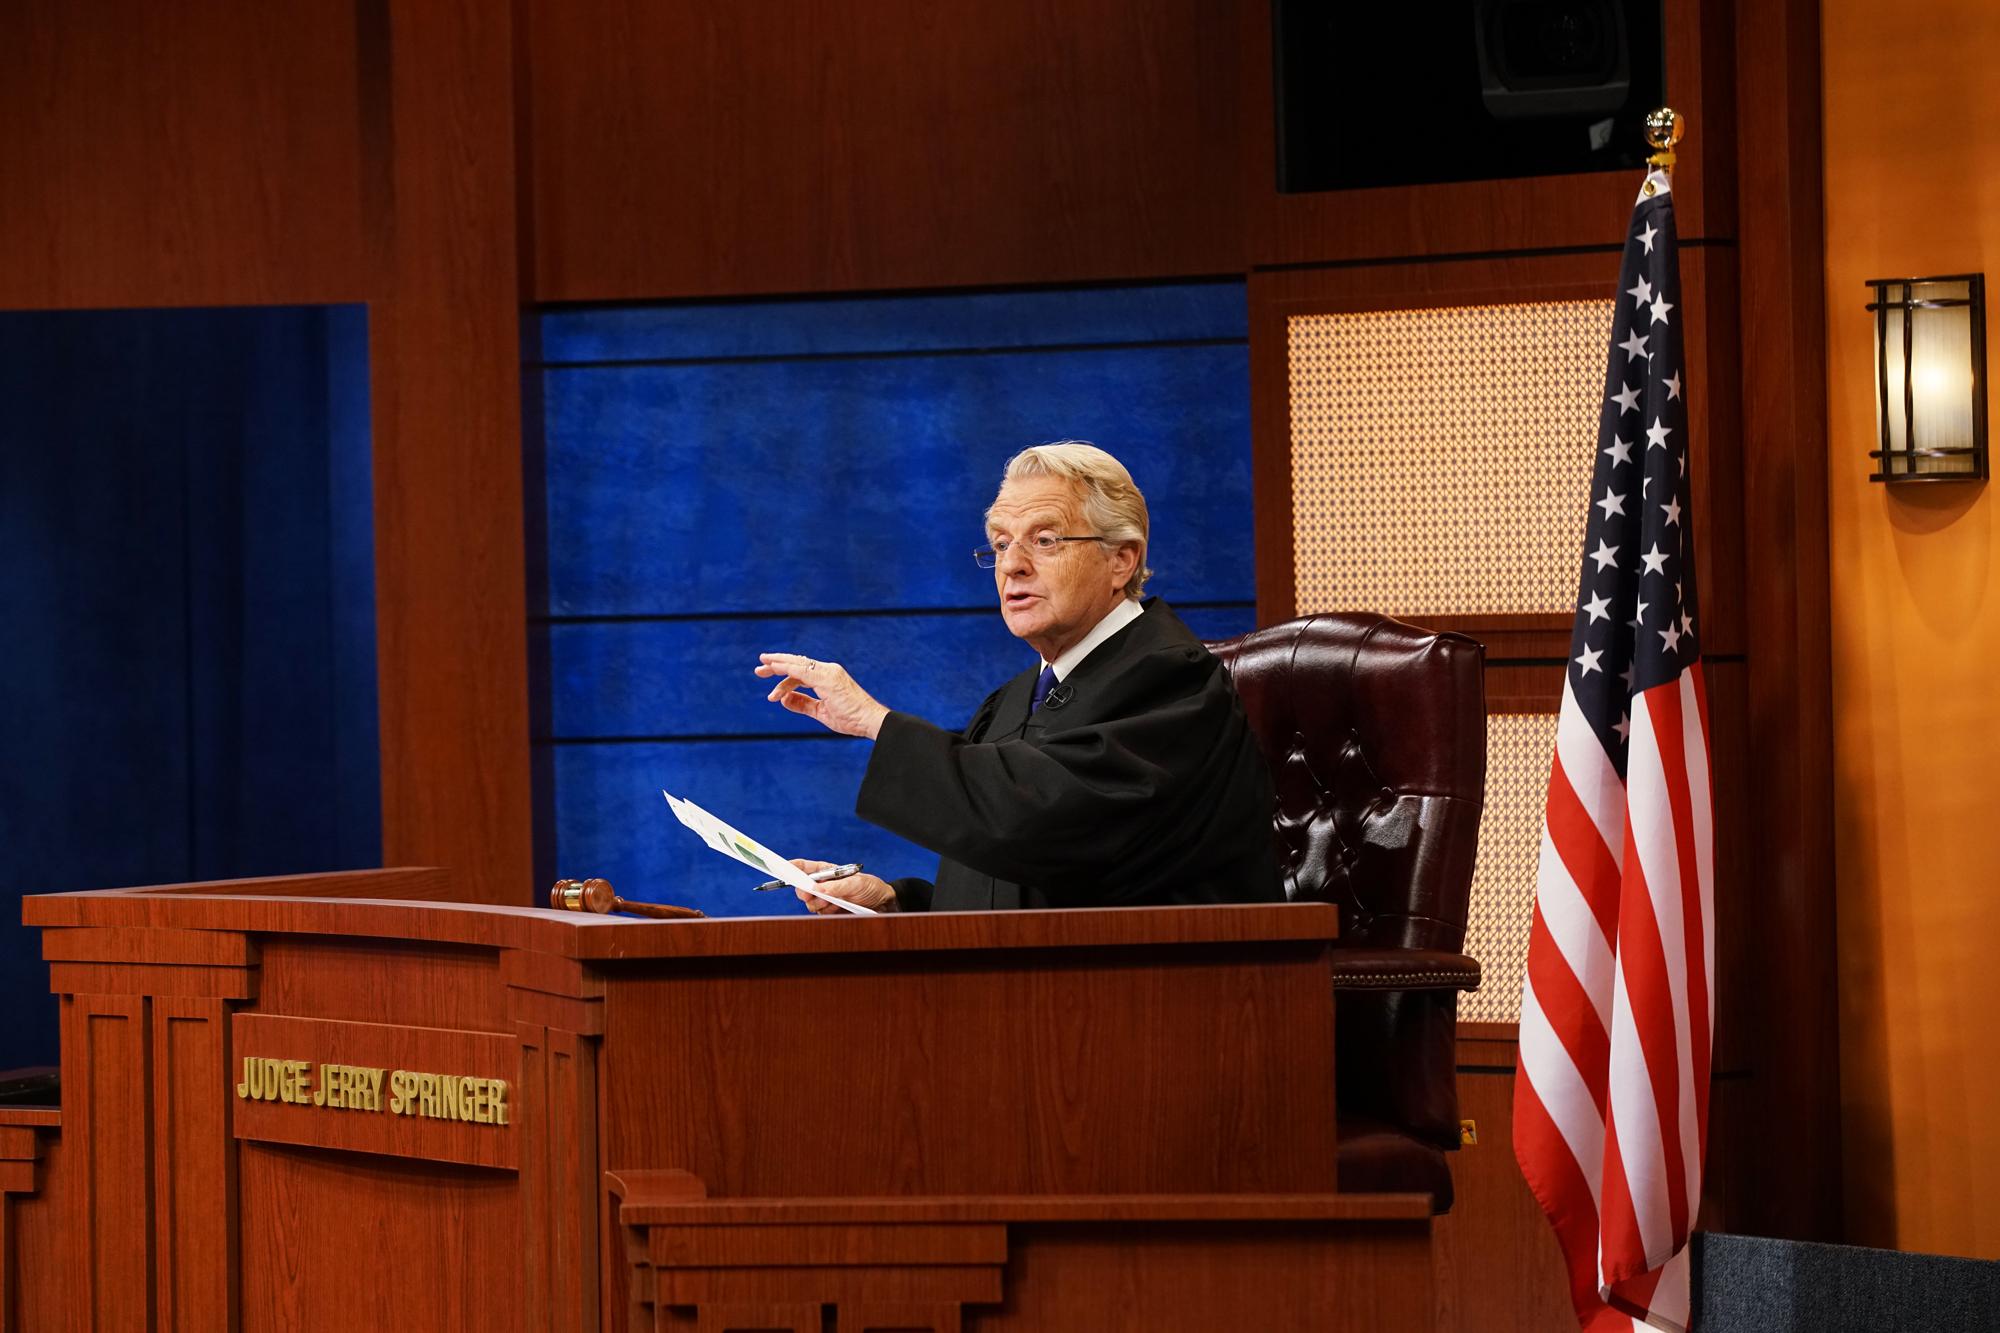 Judge Jerry SpringerCredit Bennett Raglin